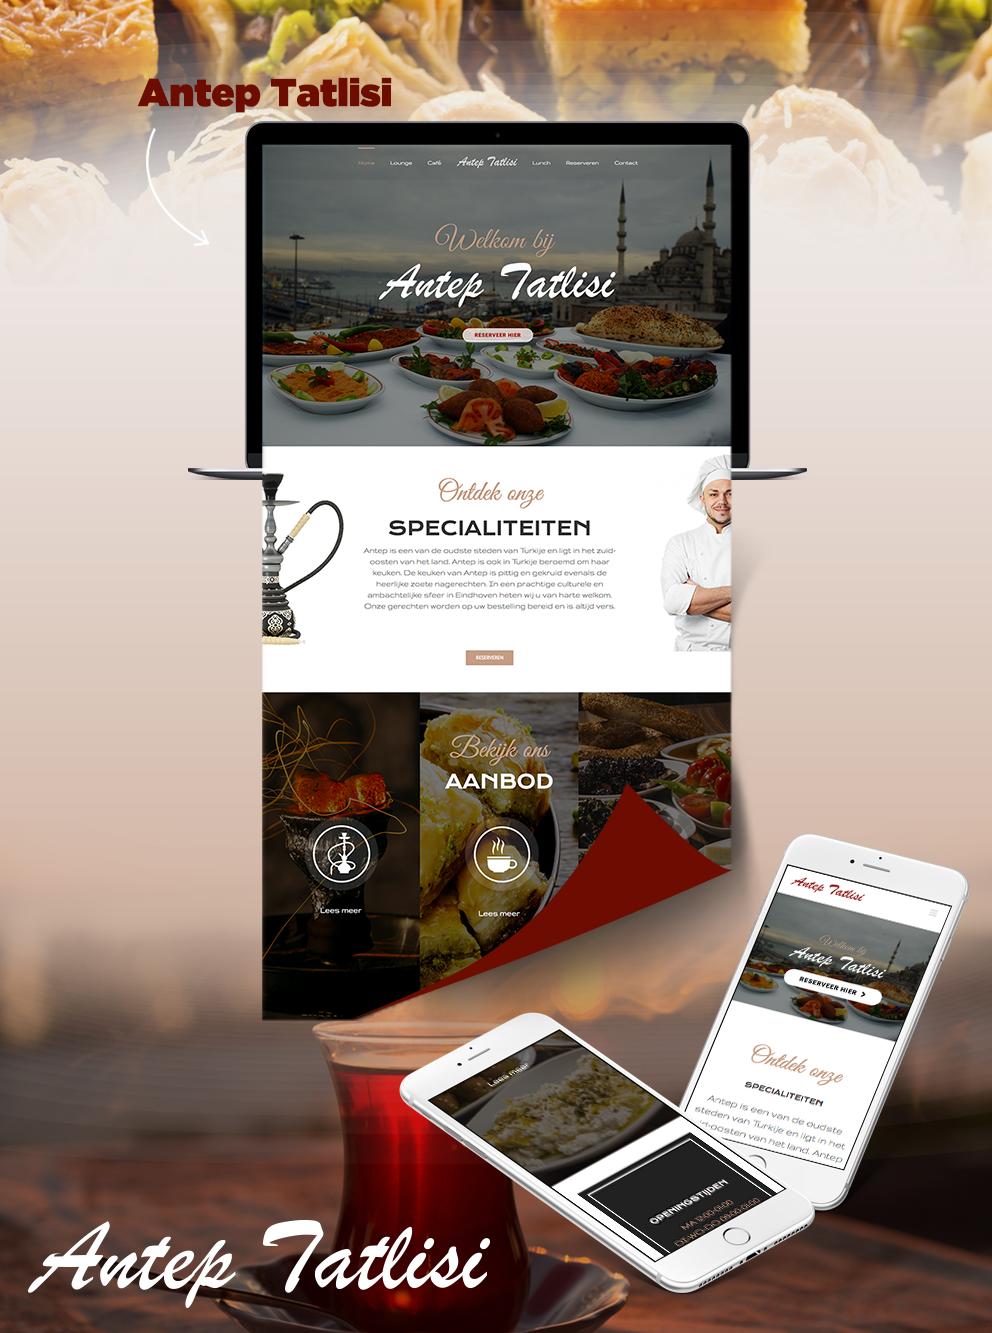 Website Antep Tatlisi